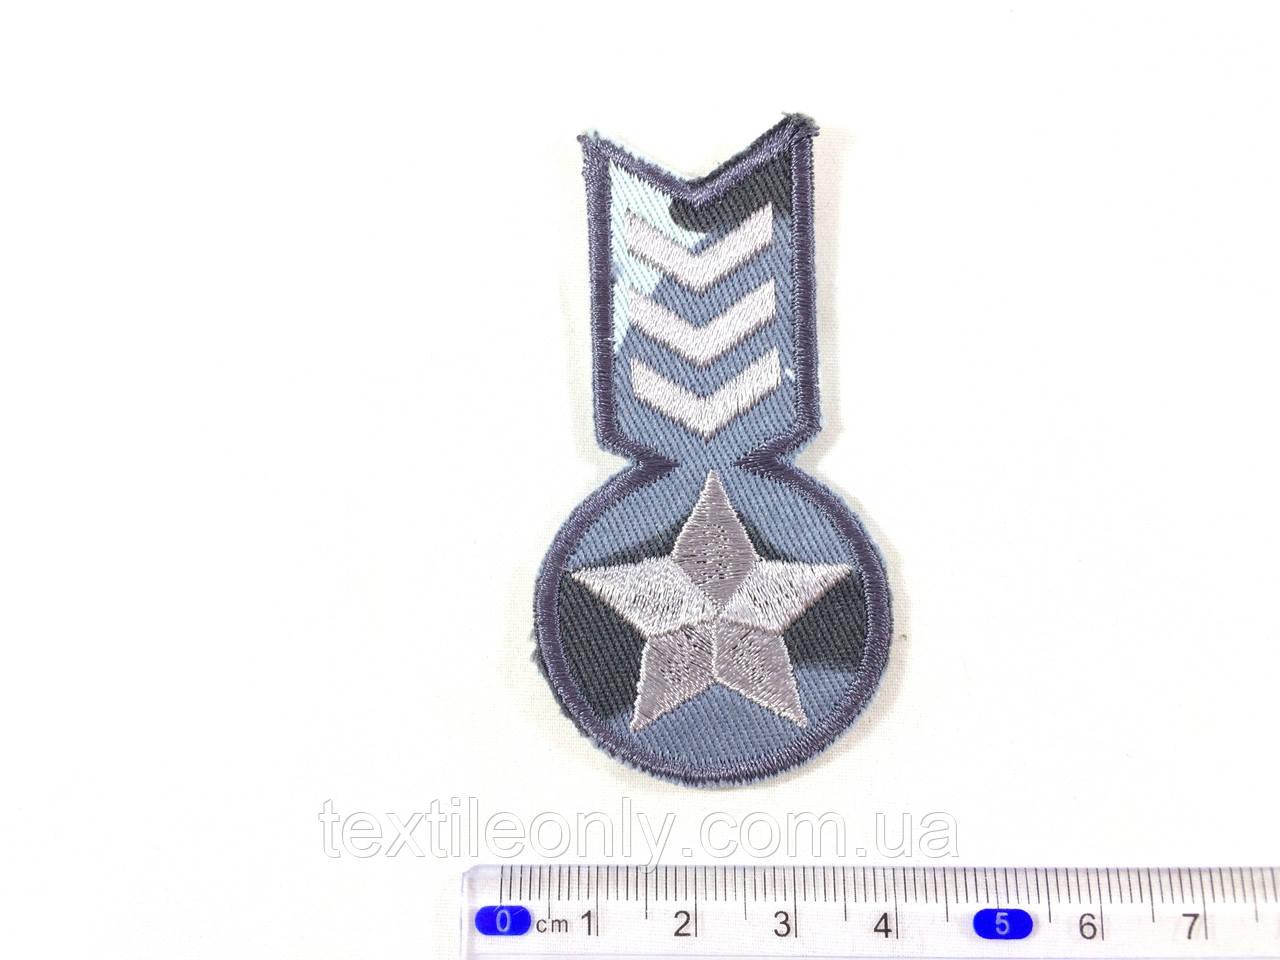 Нашивка. медаль